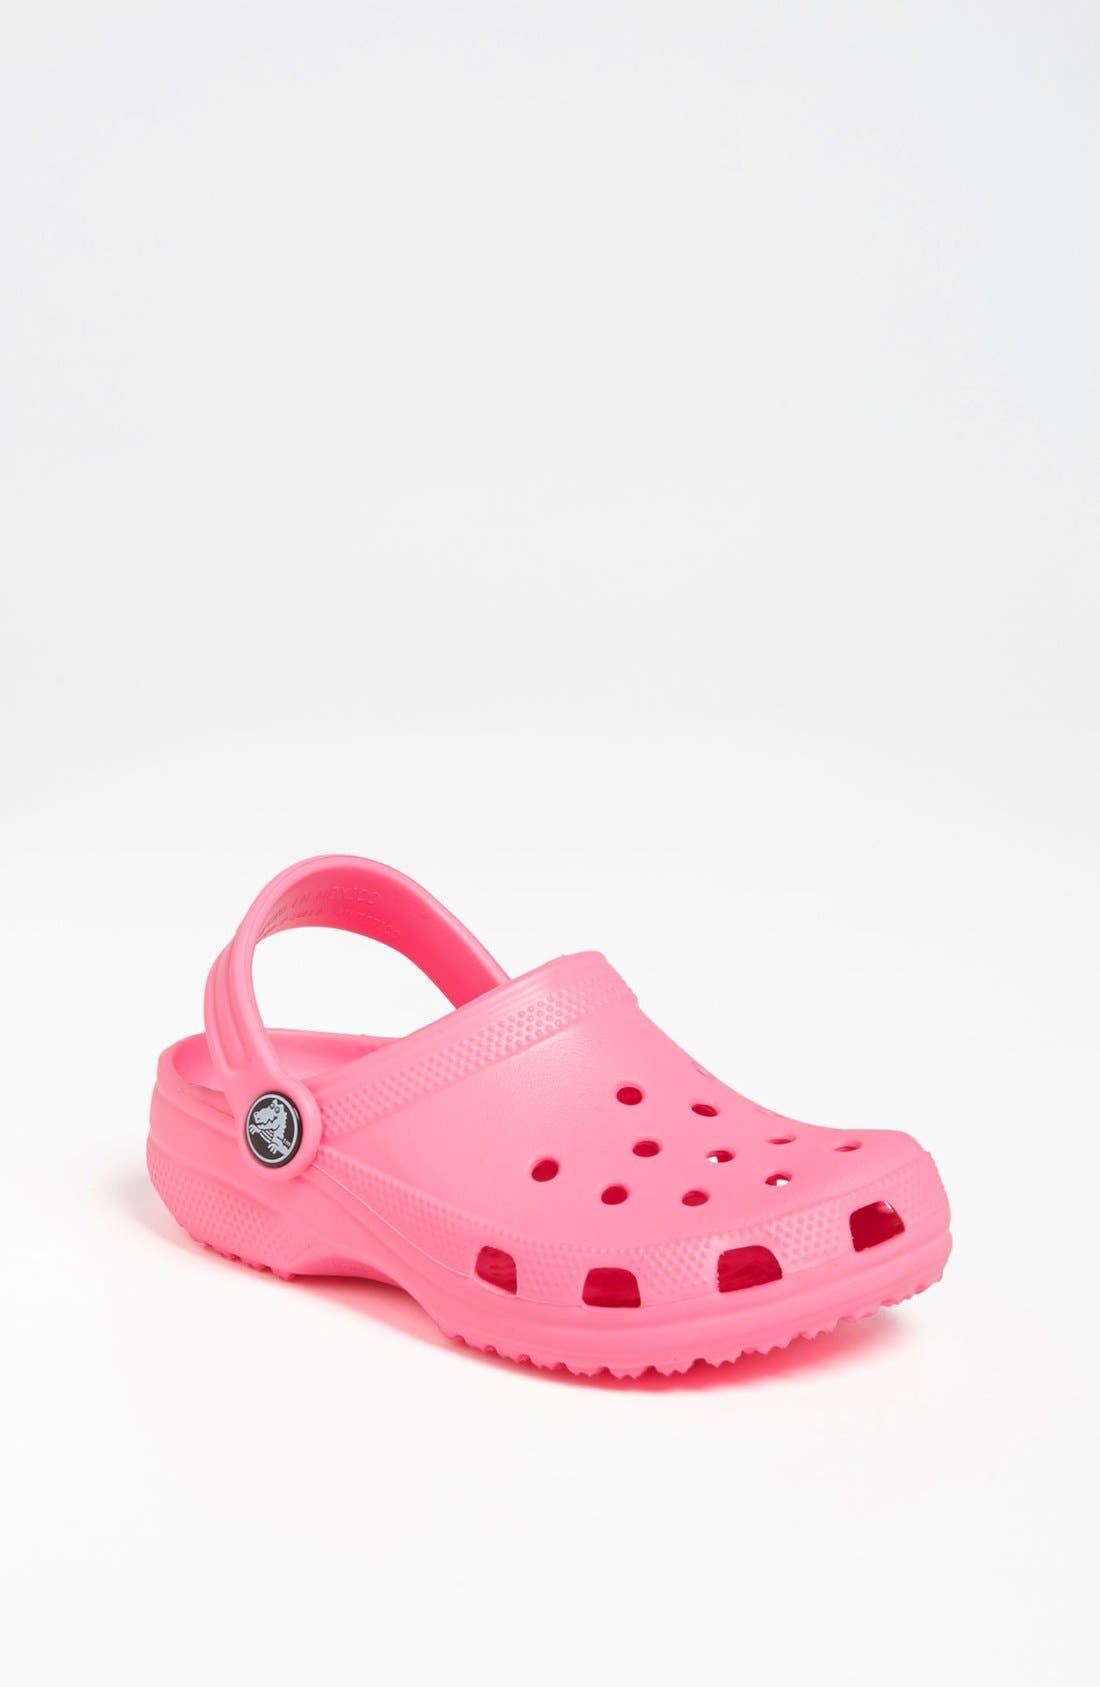 Main Image - CROCS™ 'Classic Clog' Sandal (Walker, Toddler & Little Kid)